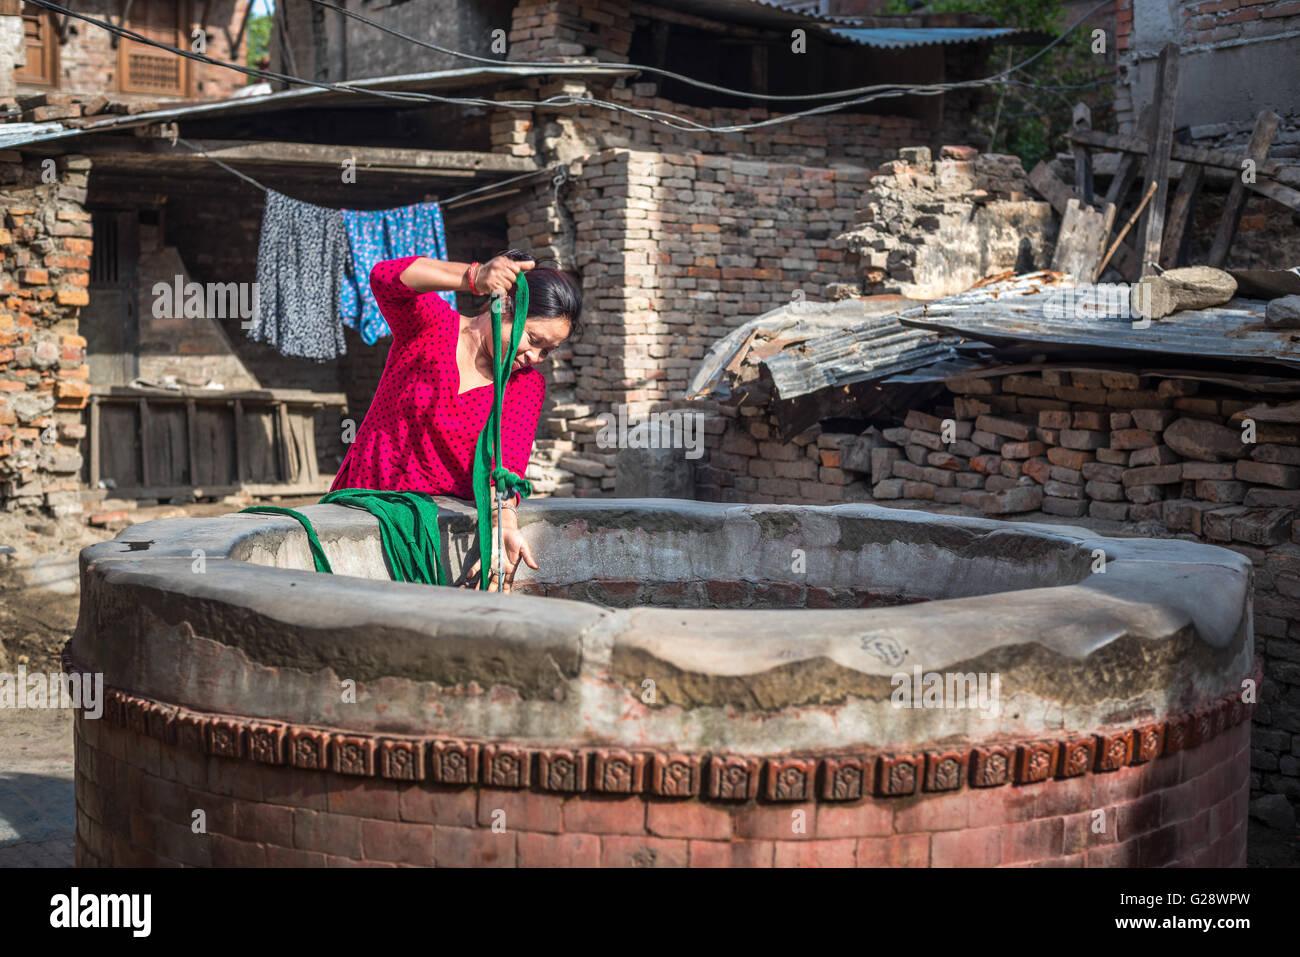 A woman drawing water from a well in old neighborhood of Bhaktapur, Nepal. © Reynold Sumayku - Stock Image